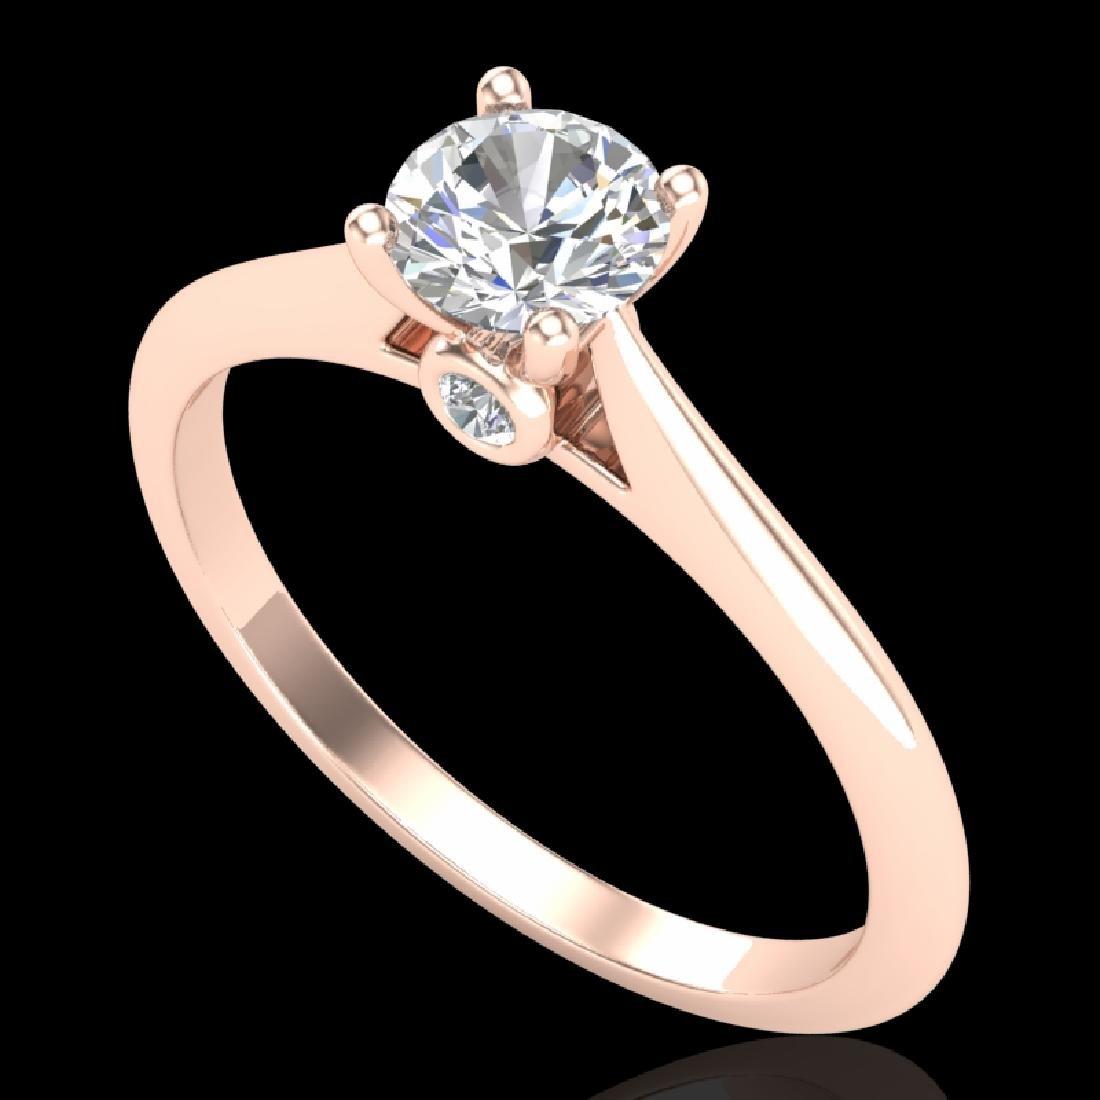 0.56 CTW VS/SI Diamond Solitaire Art Deco Ring 18K Rose